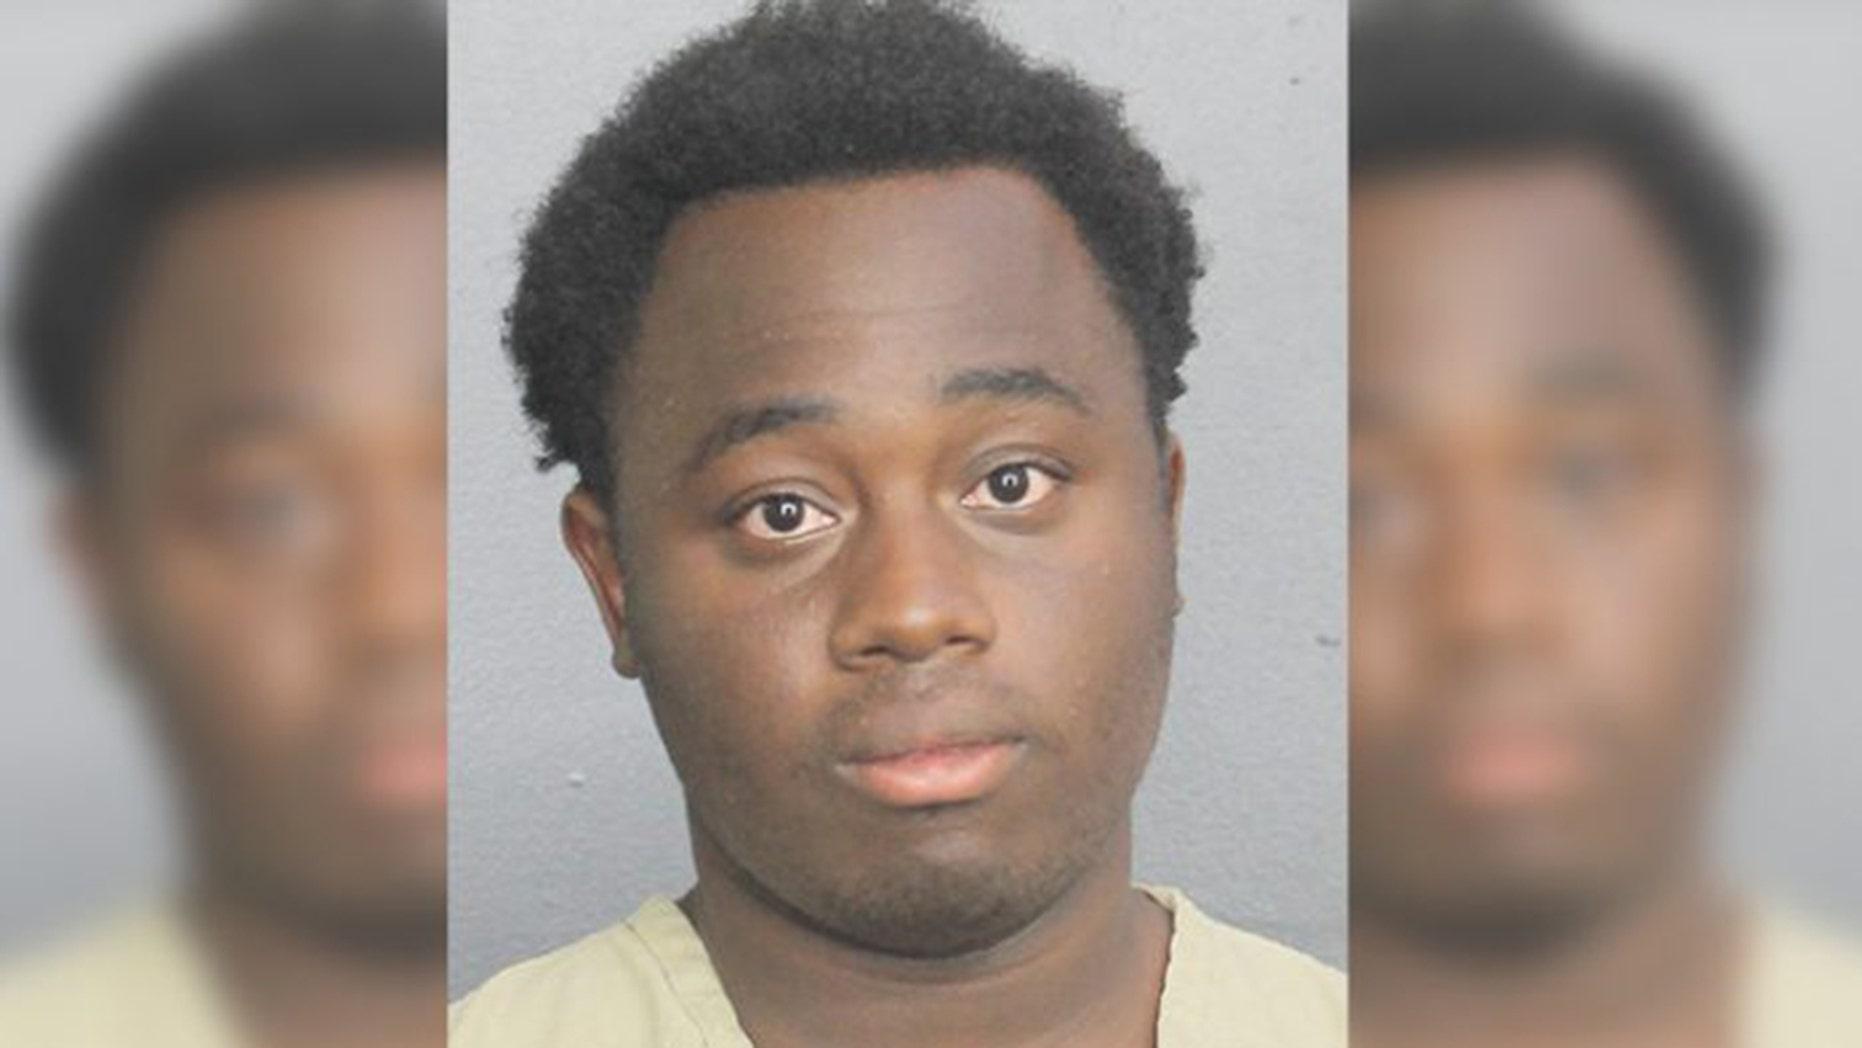 Mug shot for Tyrone Fields, 19, of Deerfield Beach, Fla.